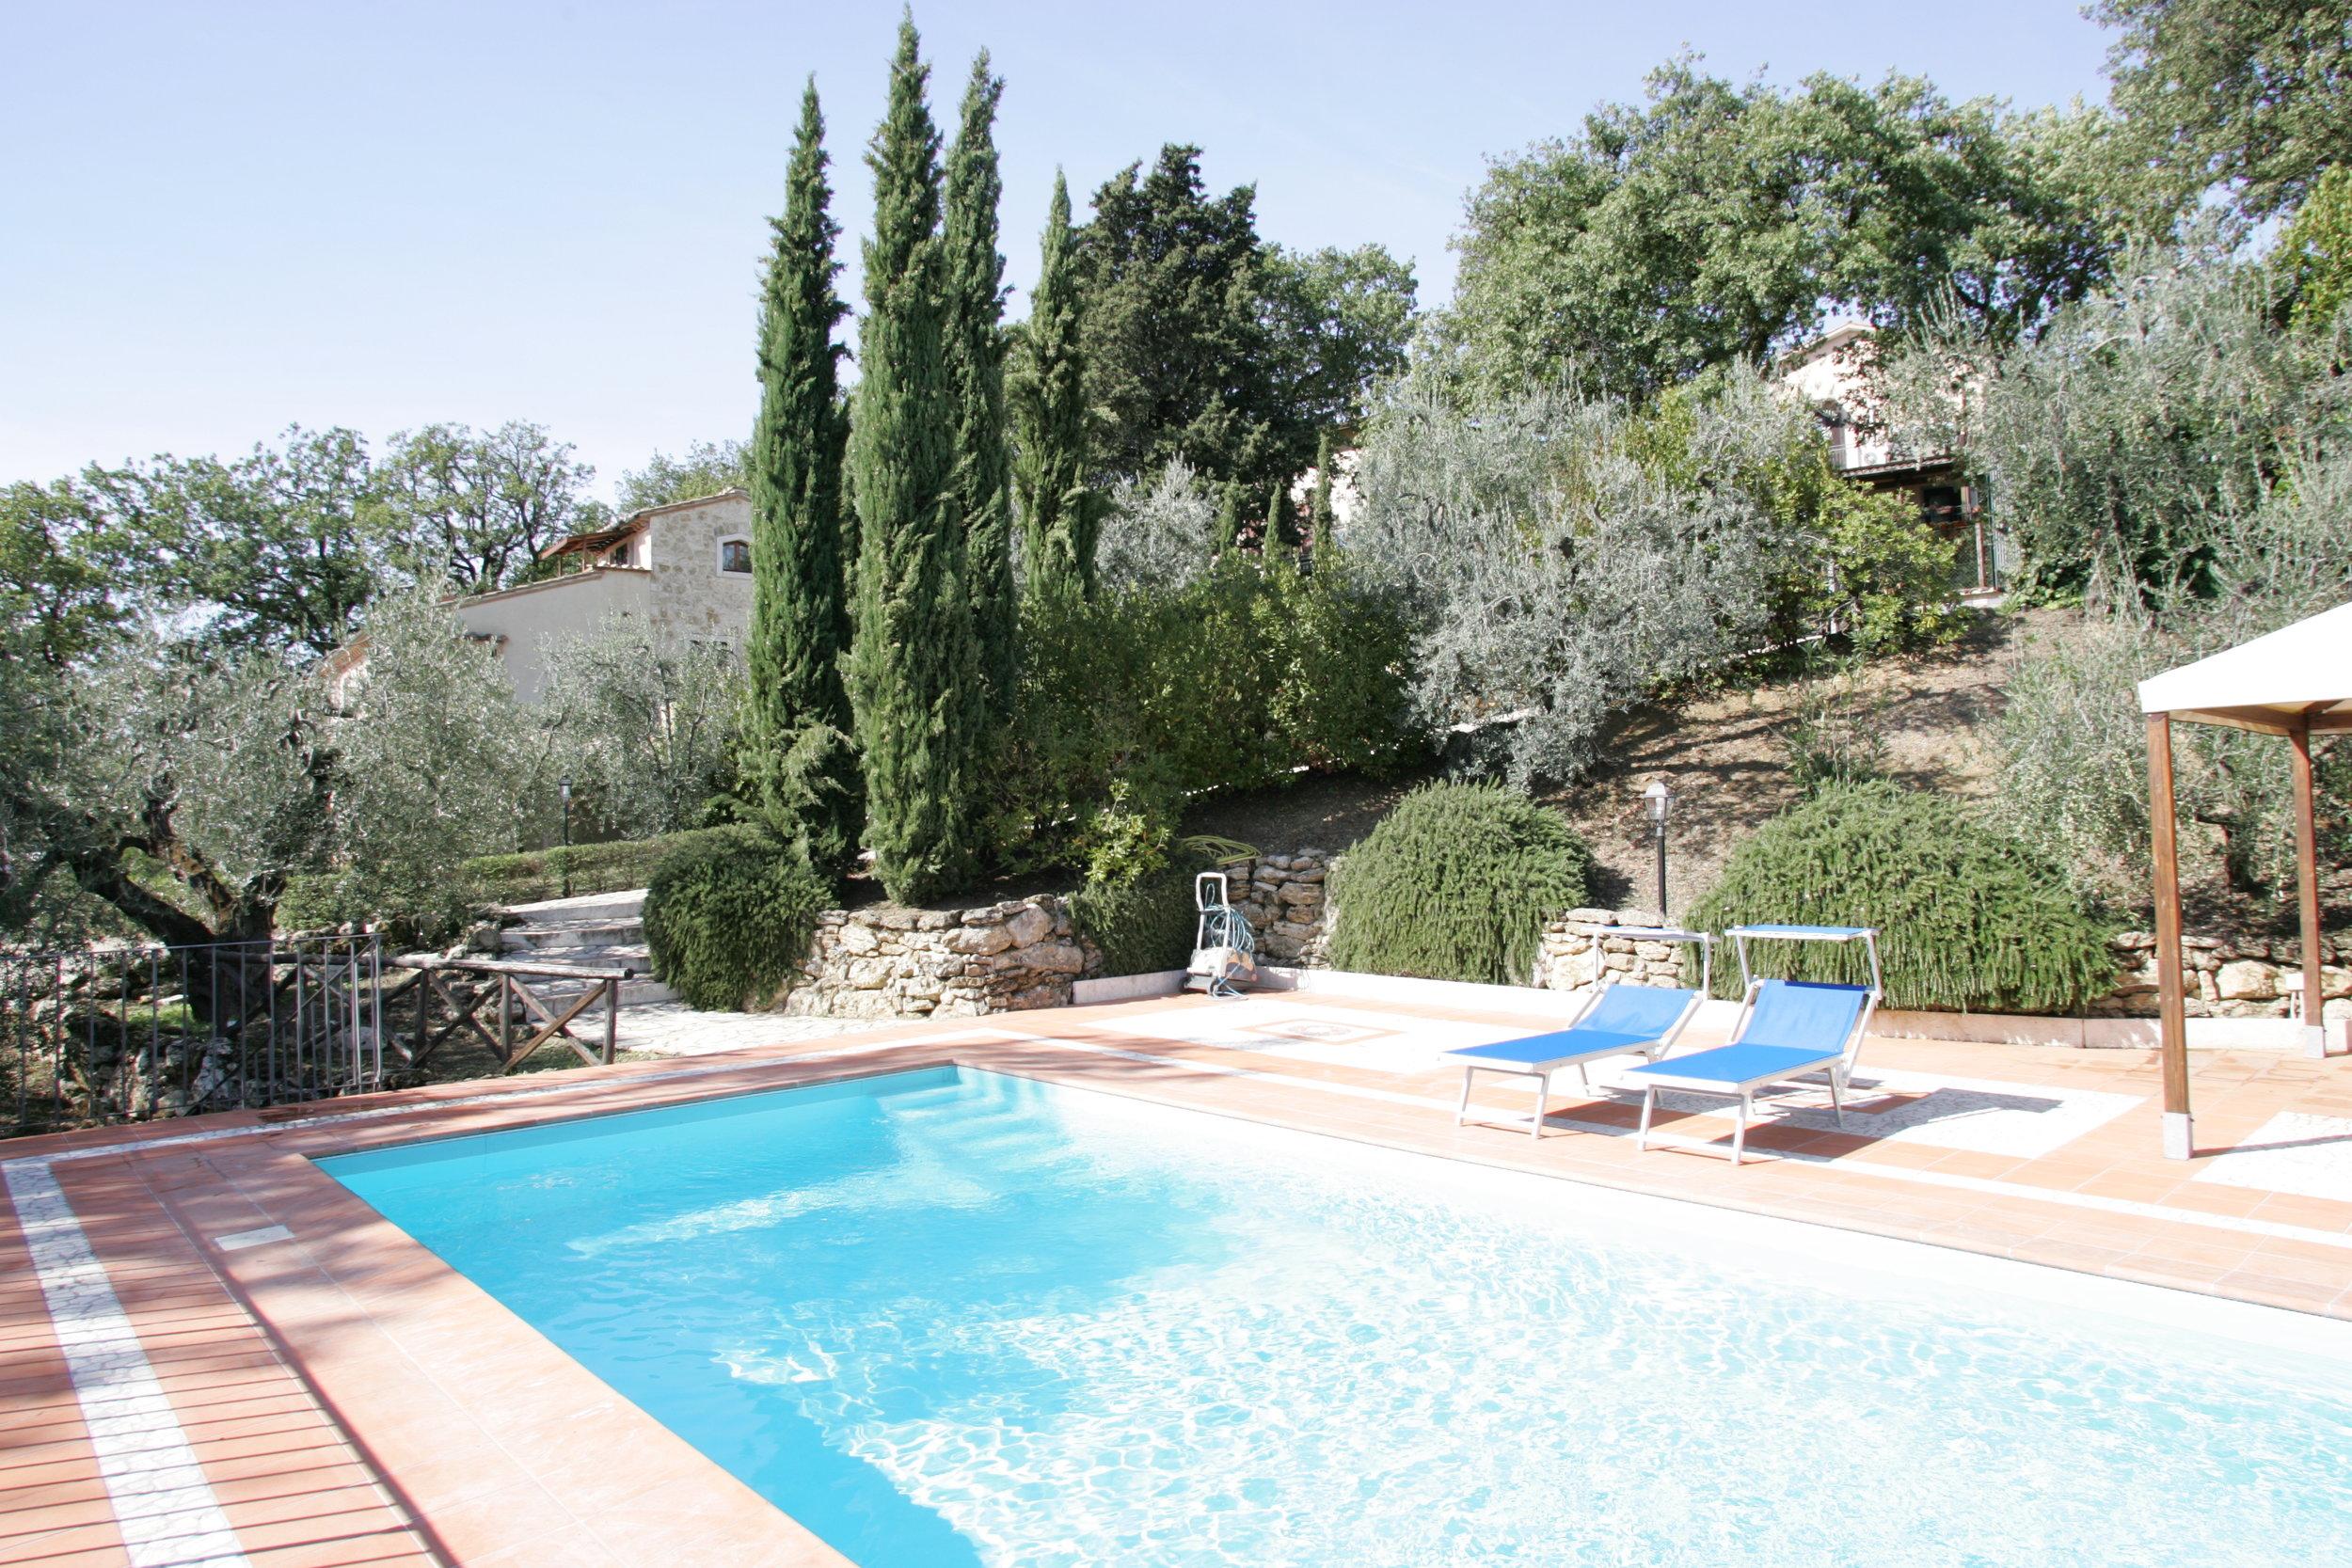 pool and villa.jpg